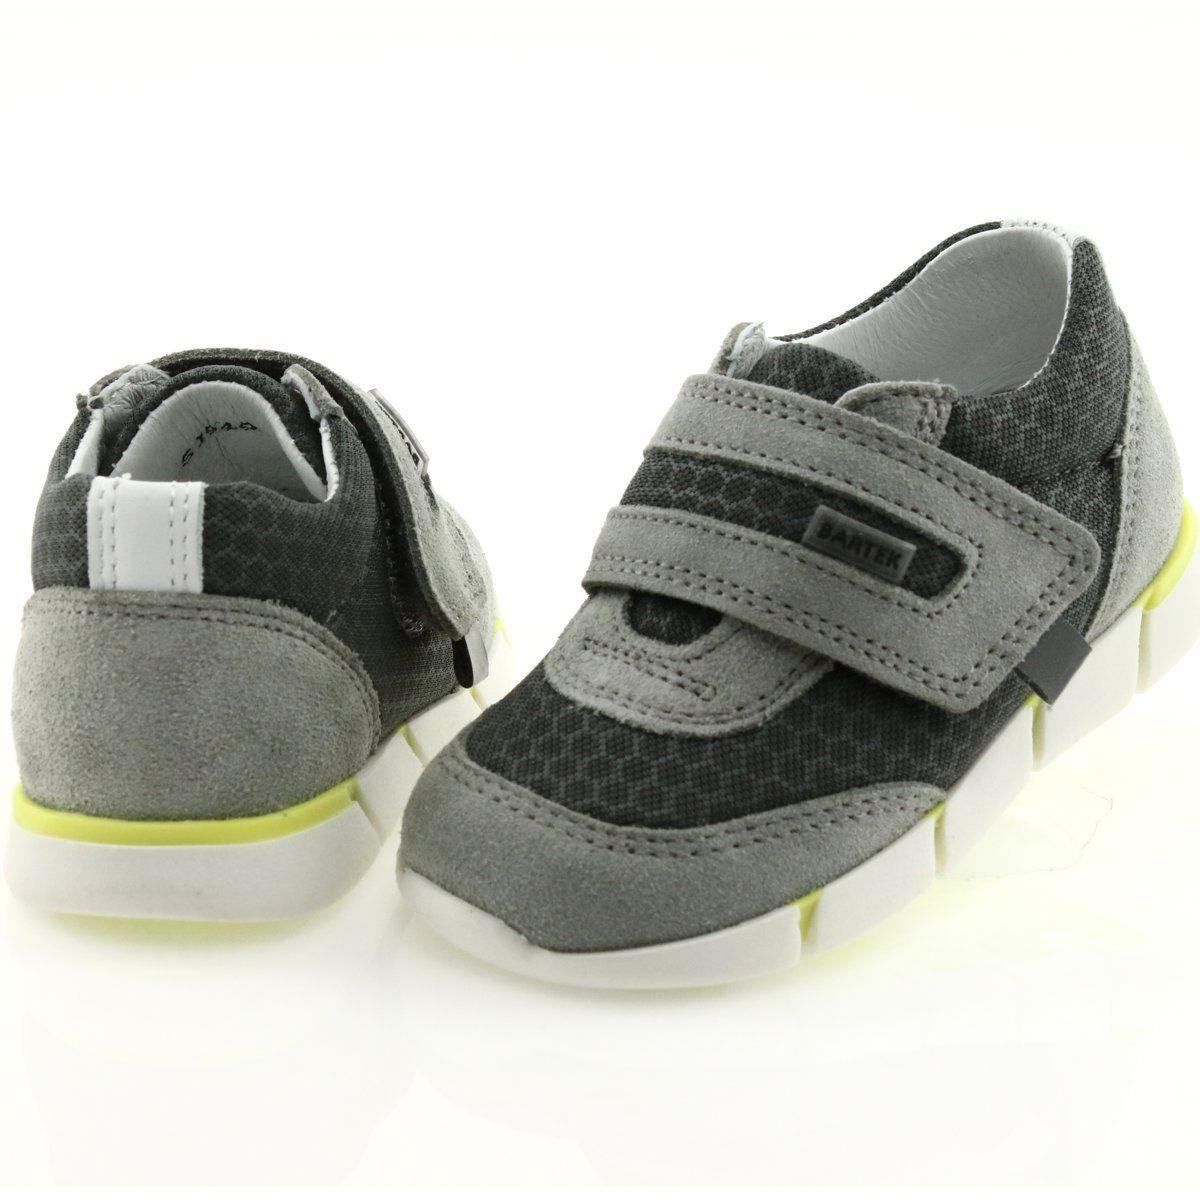 Buty Sportowe Na Rzep Bartek 51949 Szare Childrens Shoes Kid Shoes Girls Shoes